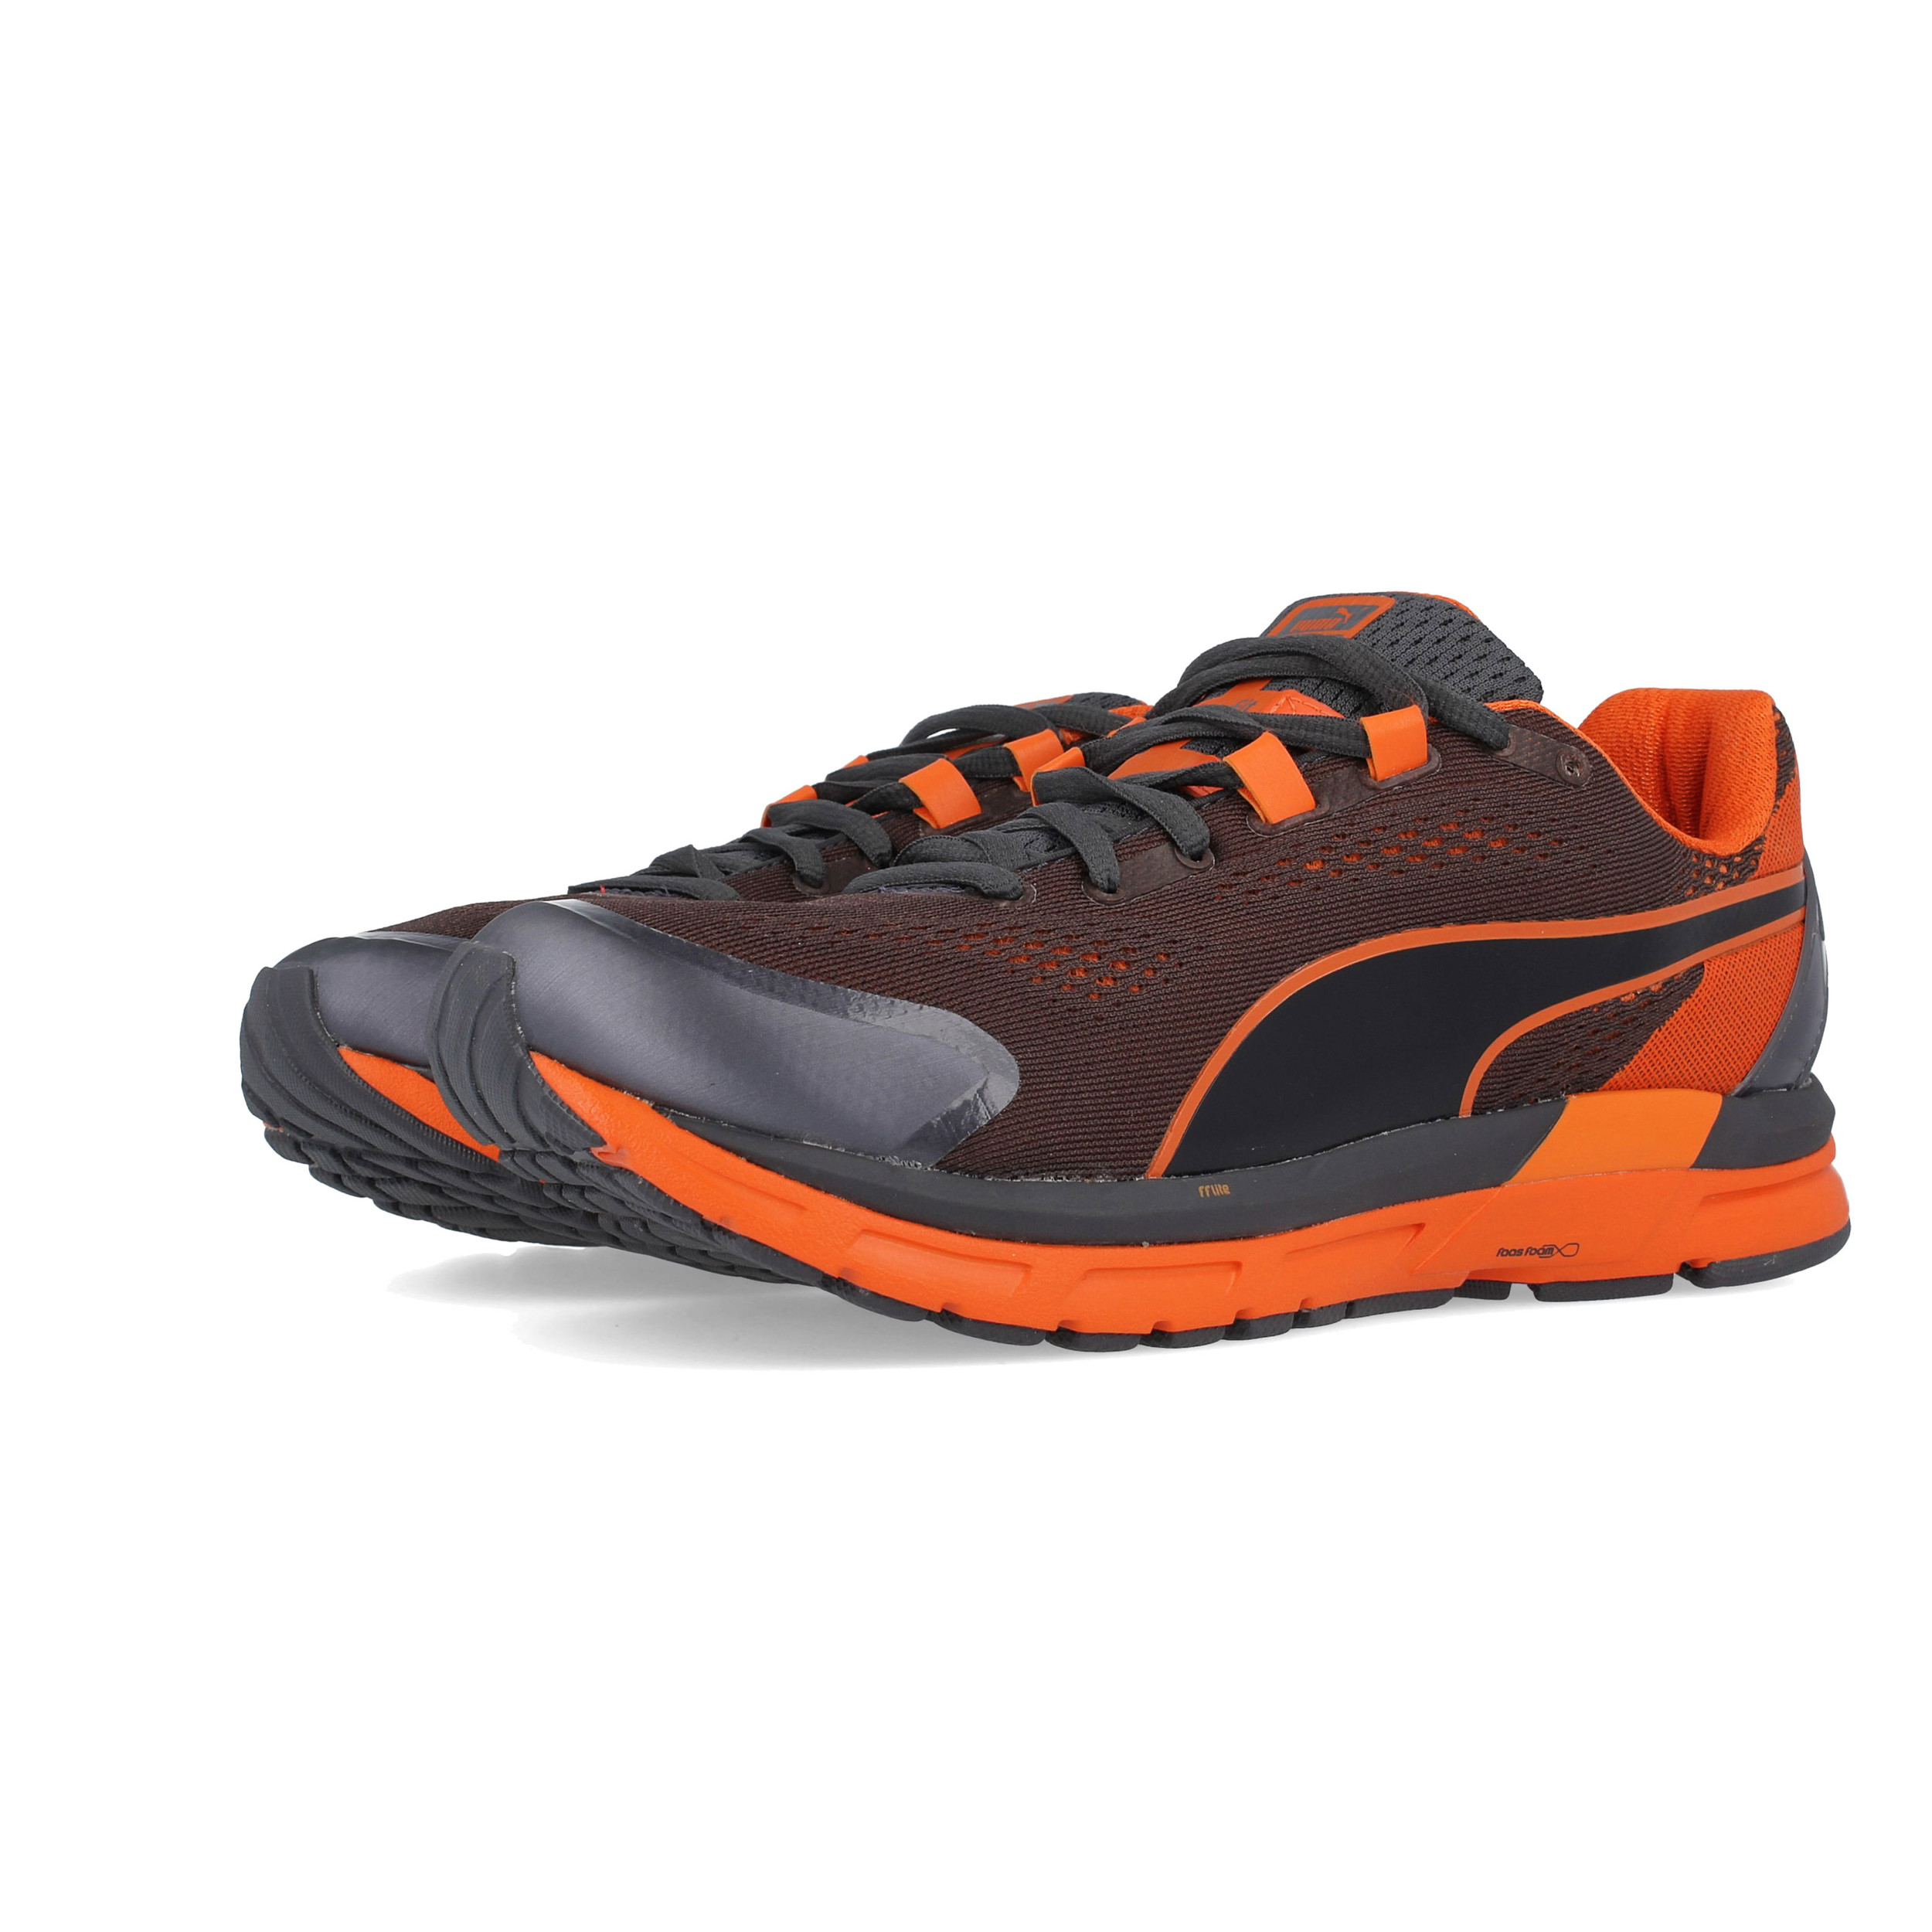 6c477a70a5 Puma Hombre Faas 600 S V2 Correr Zapatos Zapatillas Negro Naranja Deporte